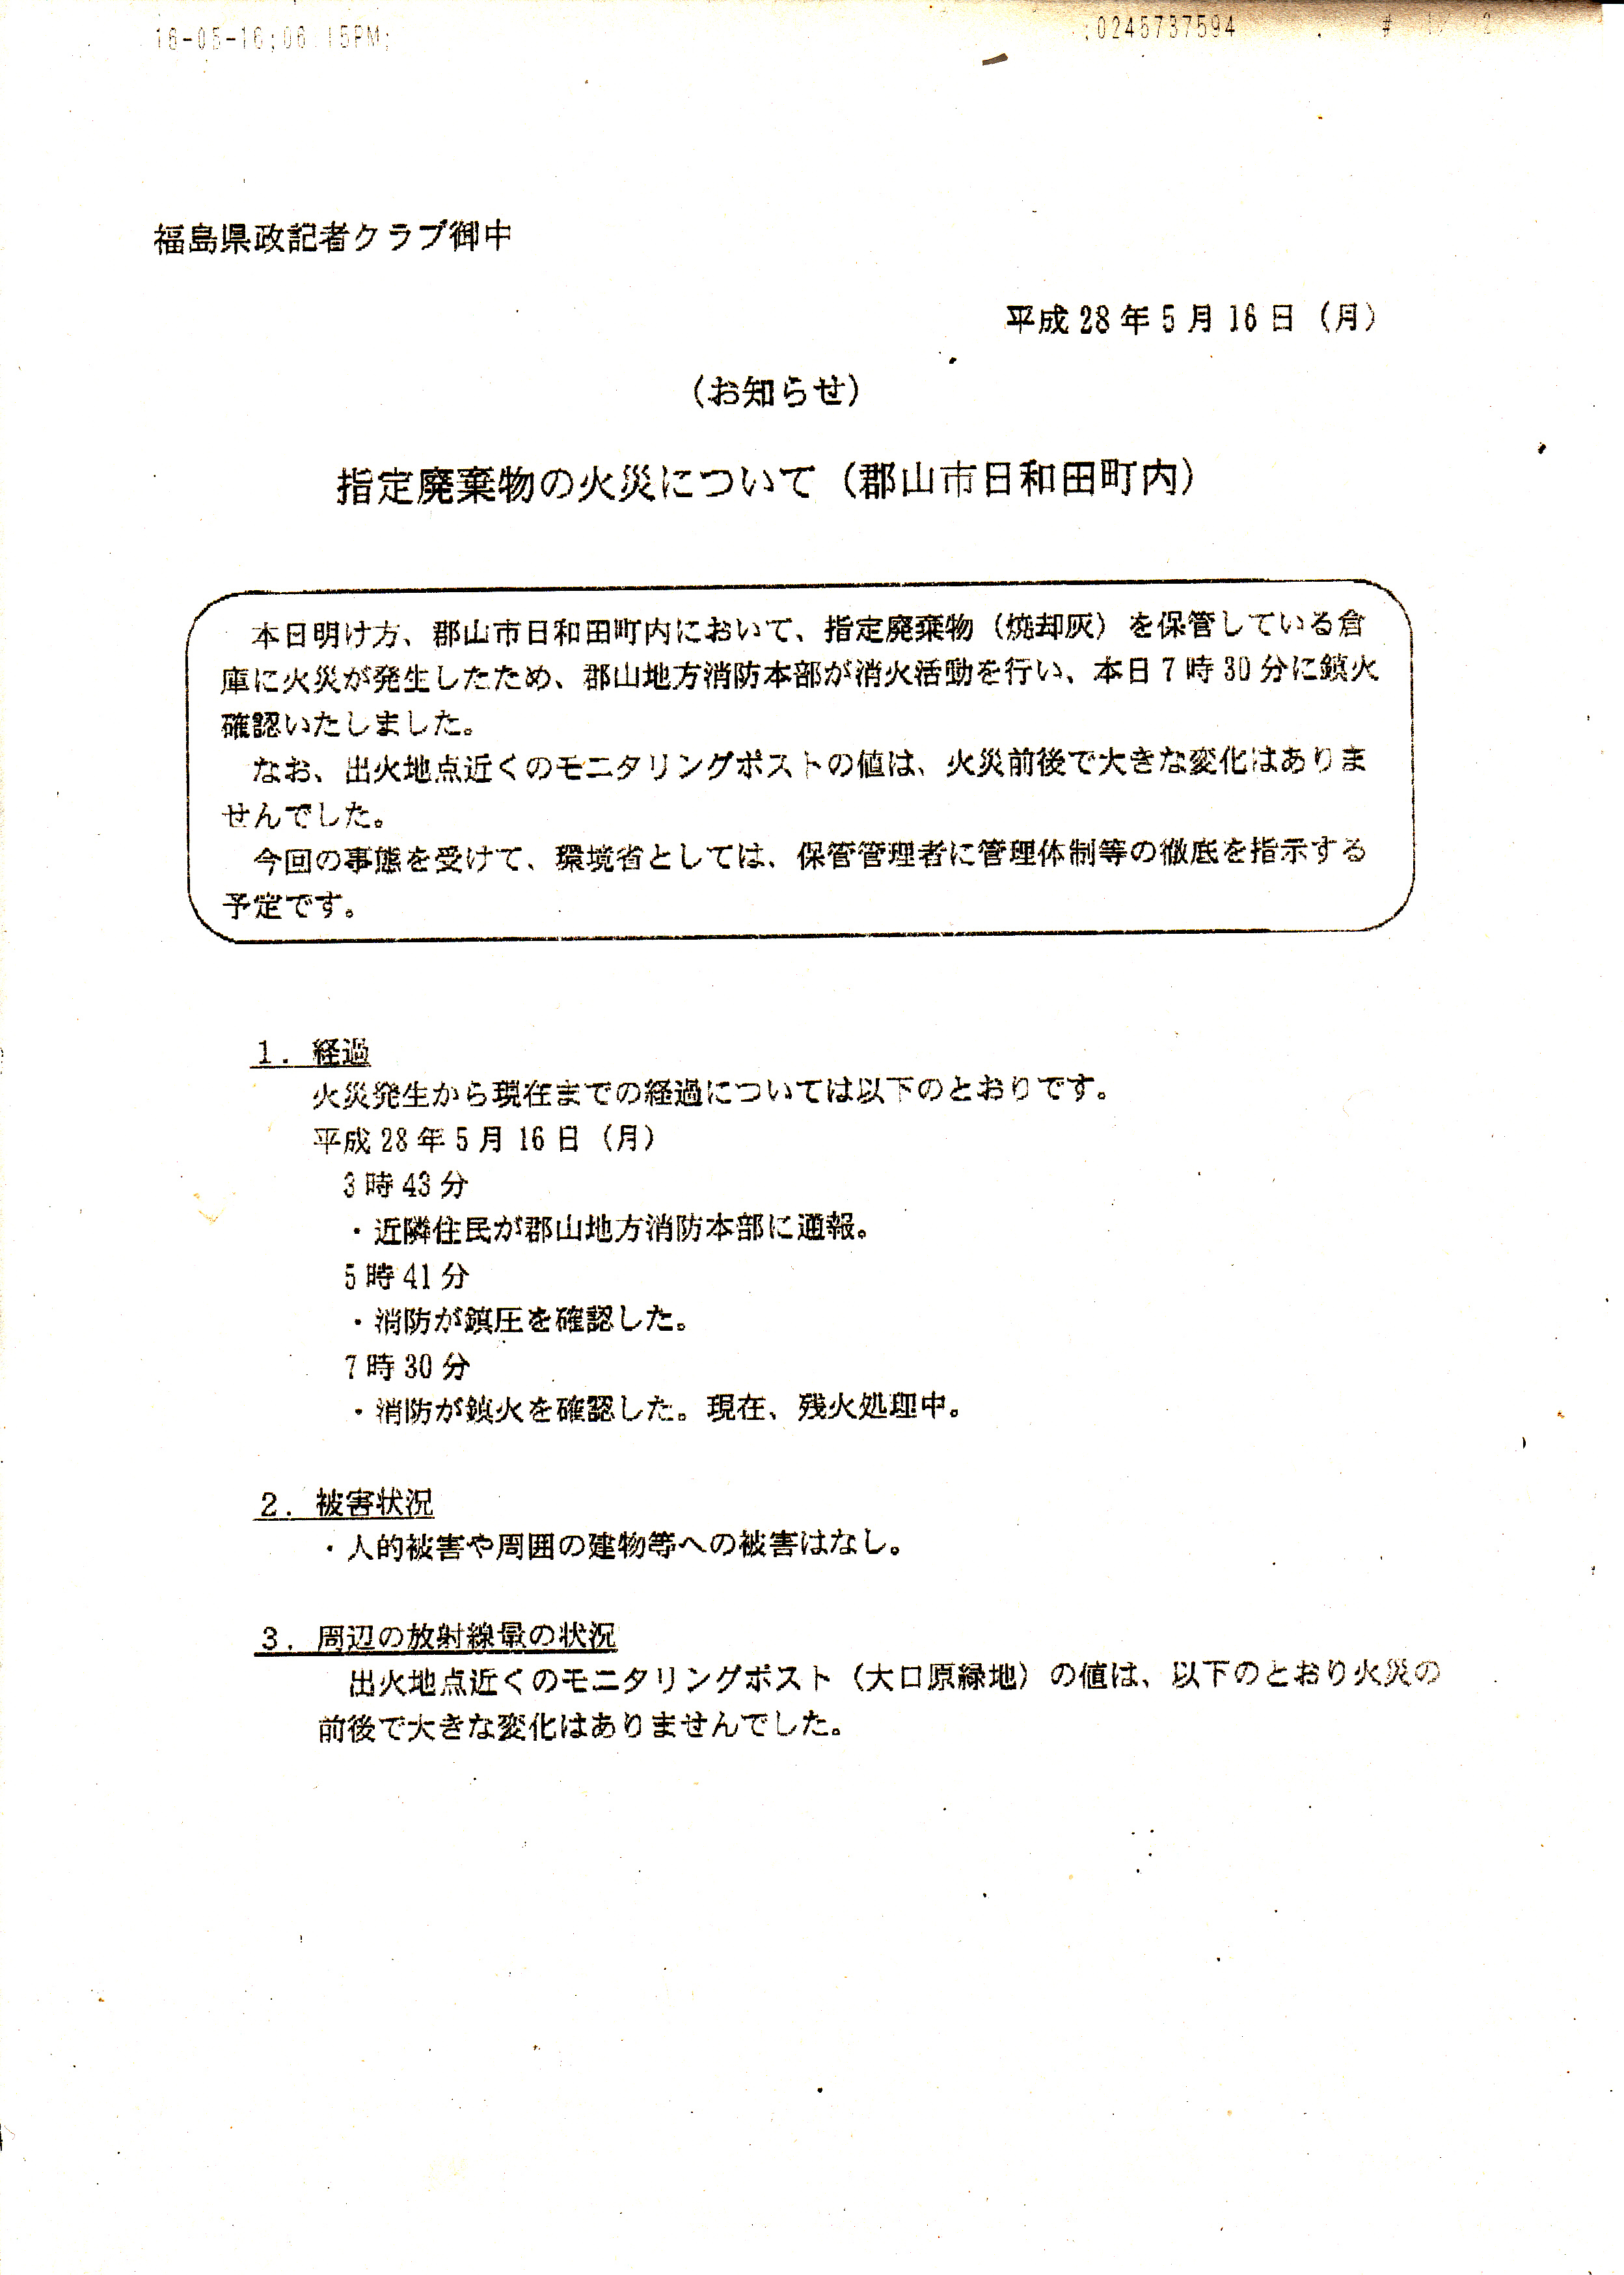 K組合火災_0001